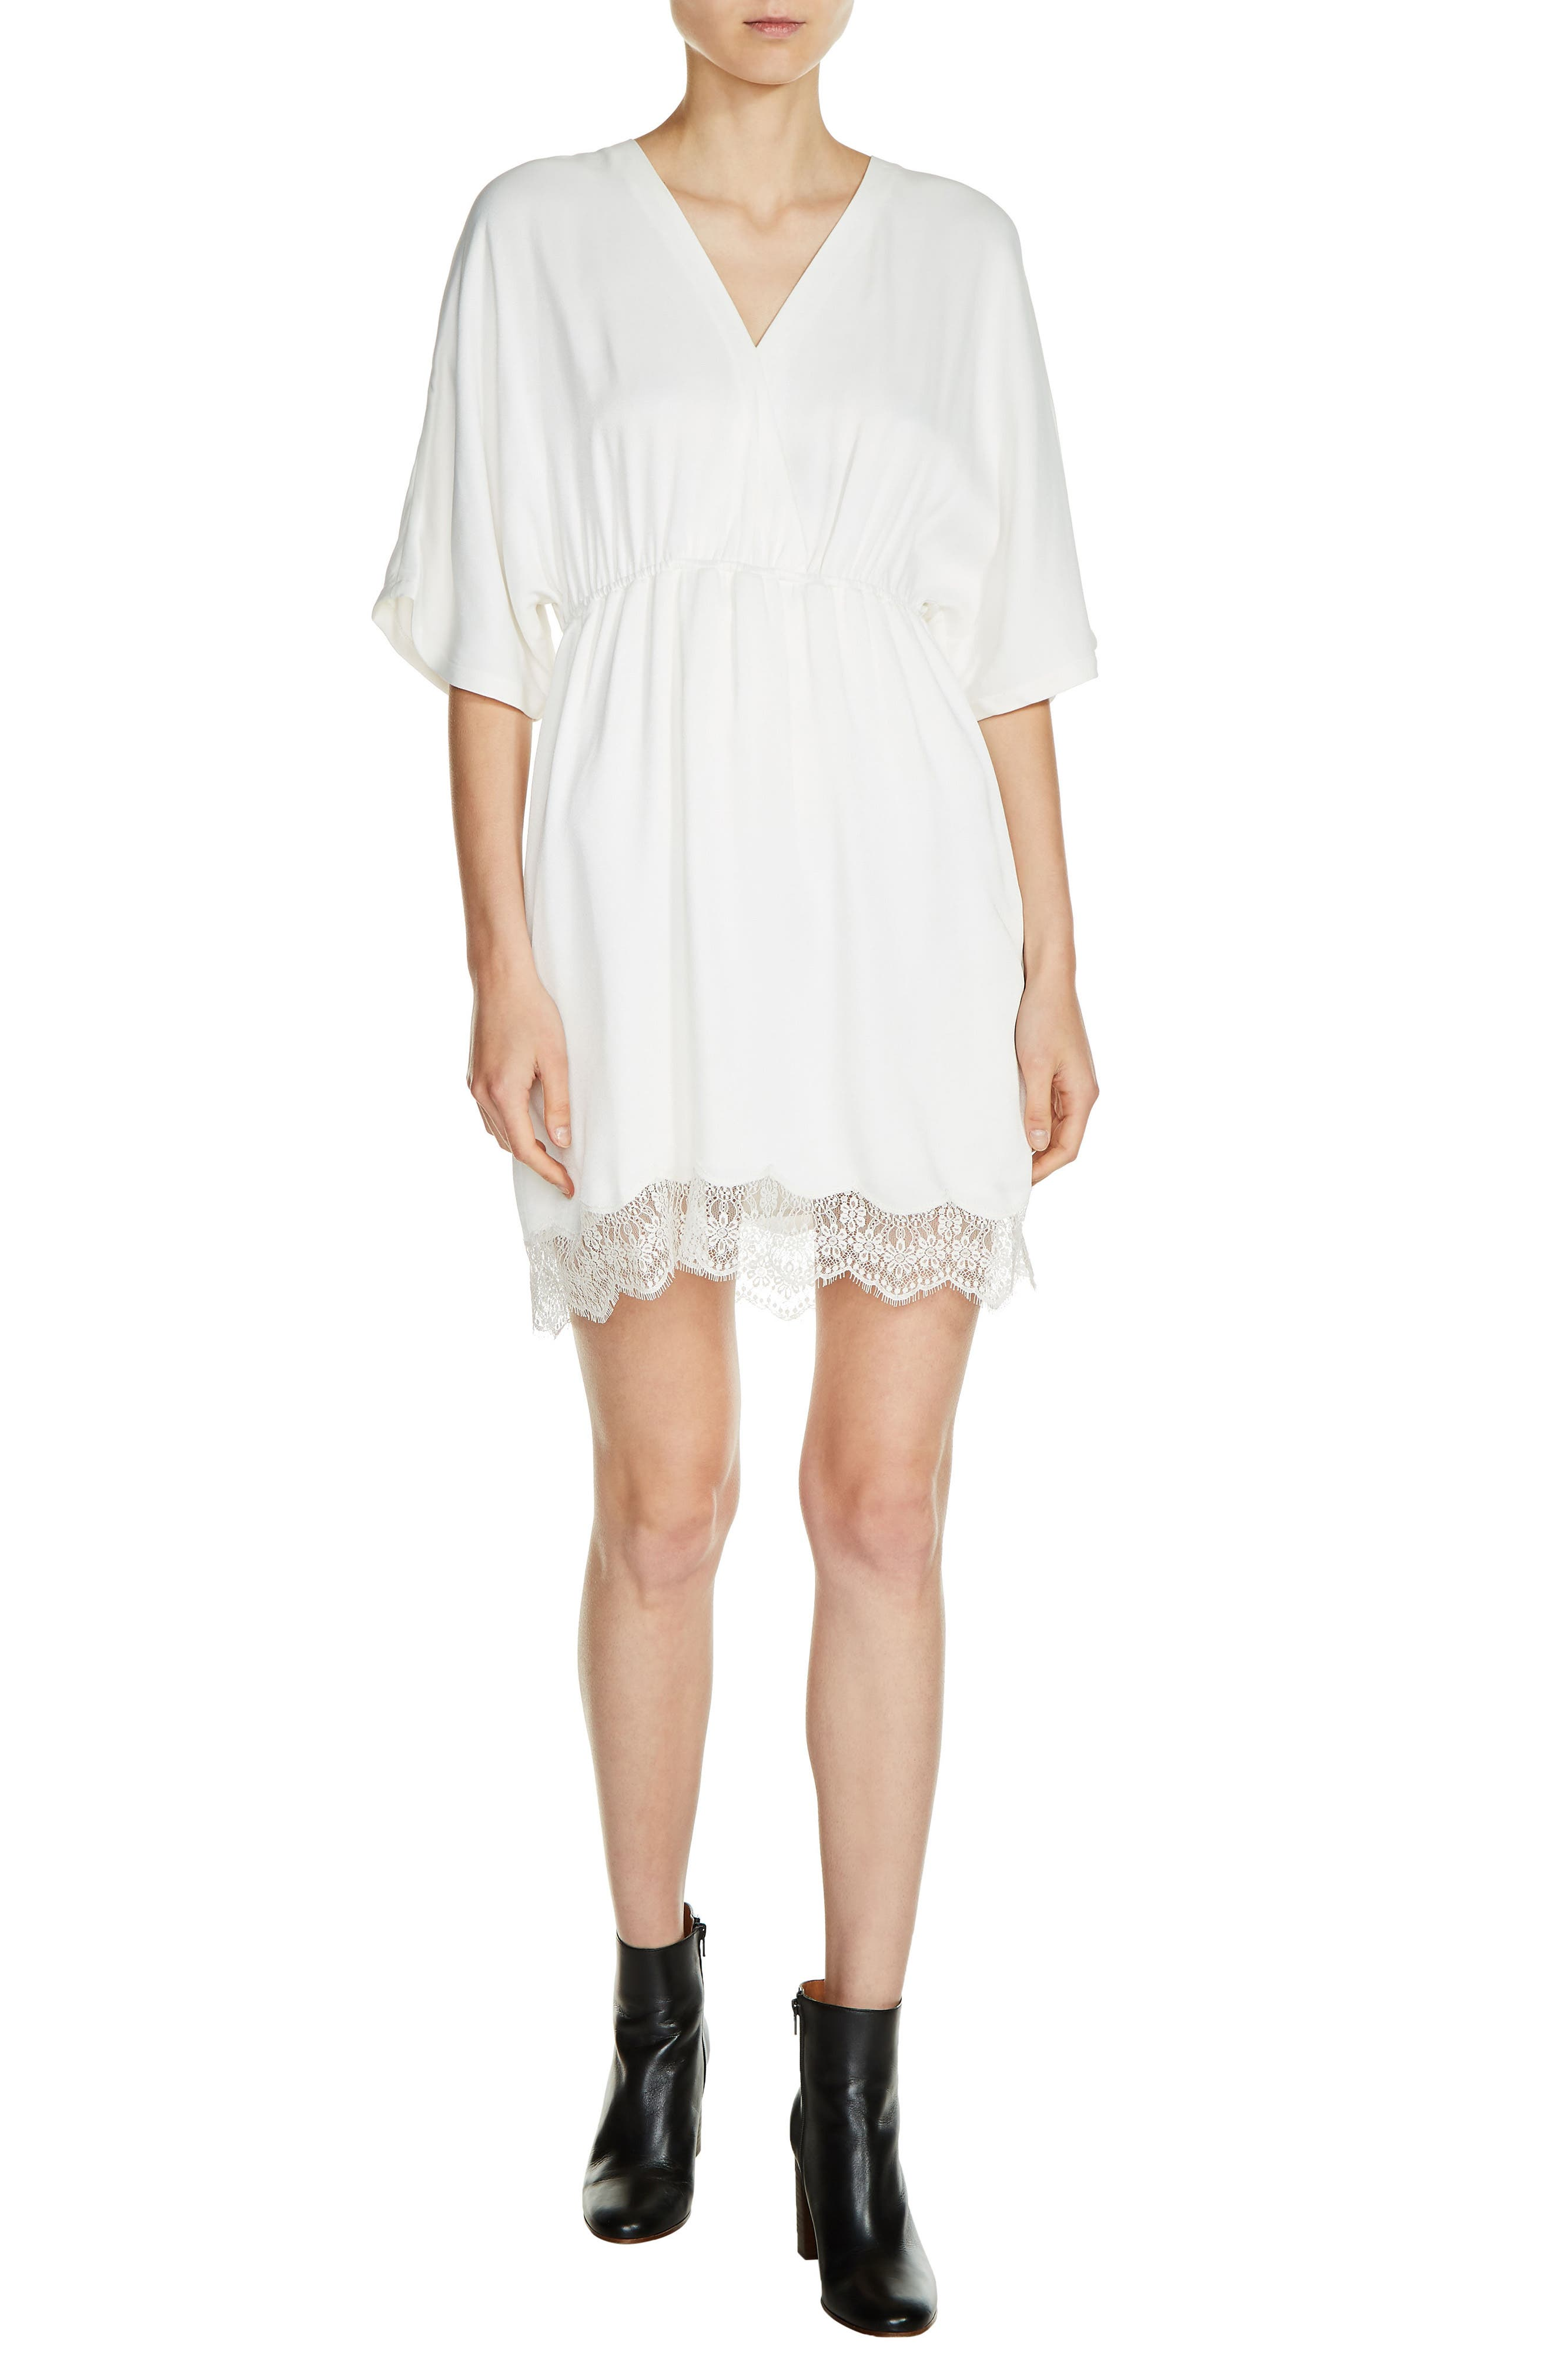 Alternate Image 1 Selected - maje Lace Trim V-Neck Dress